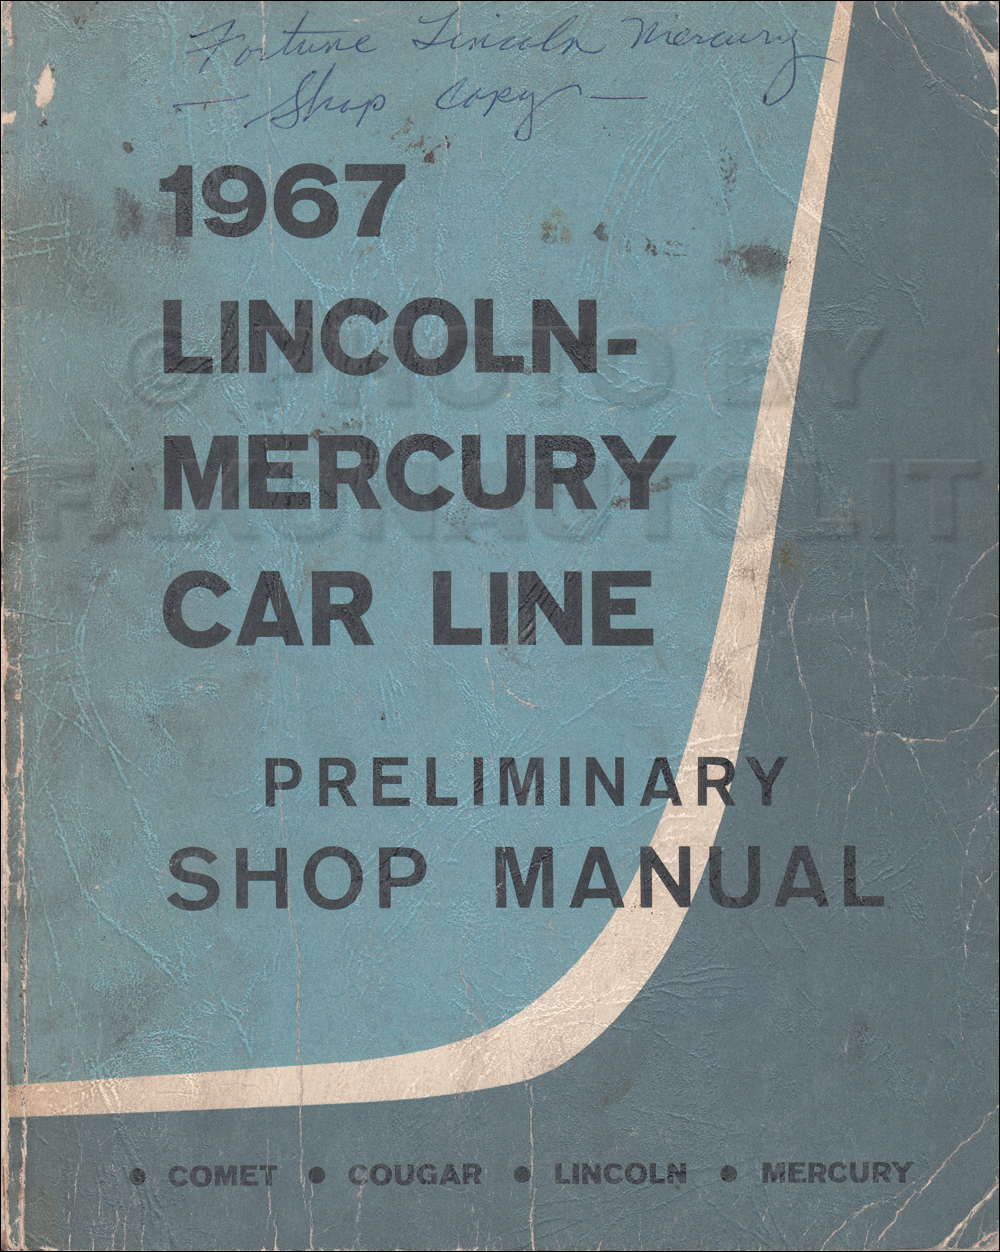 1967 lincoln wiring diagram manual reprint 1967 lincoln mercury car preliminary shop manual original